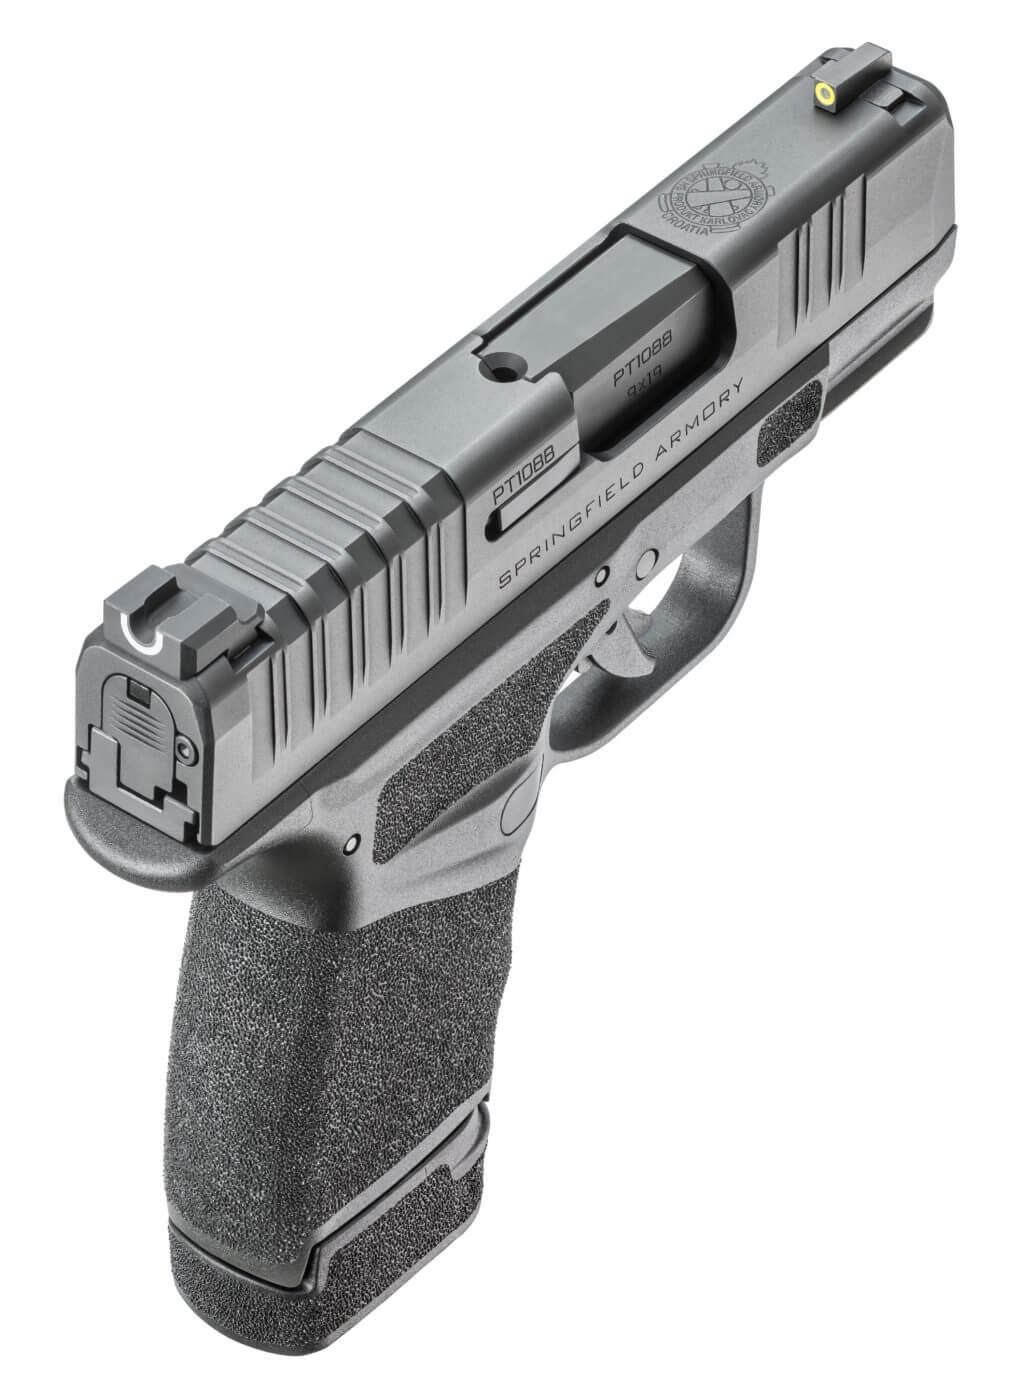 Rear shot of Hellcat handgun